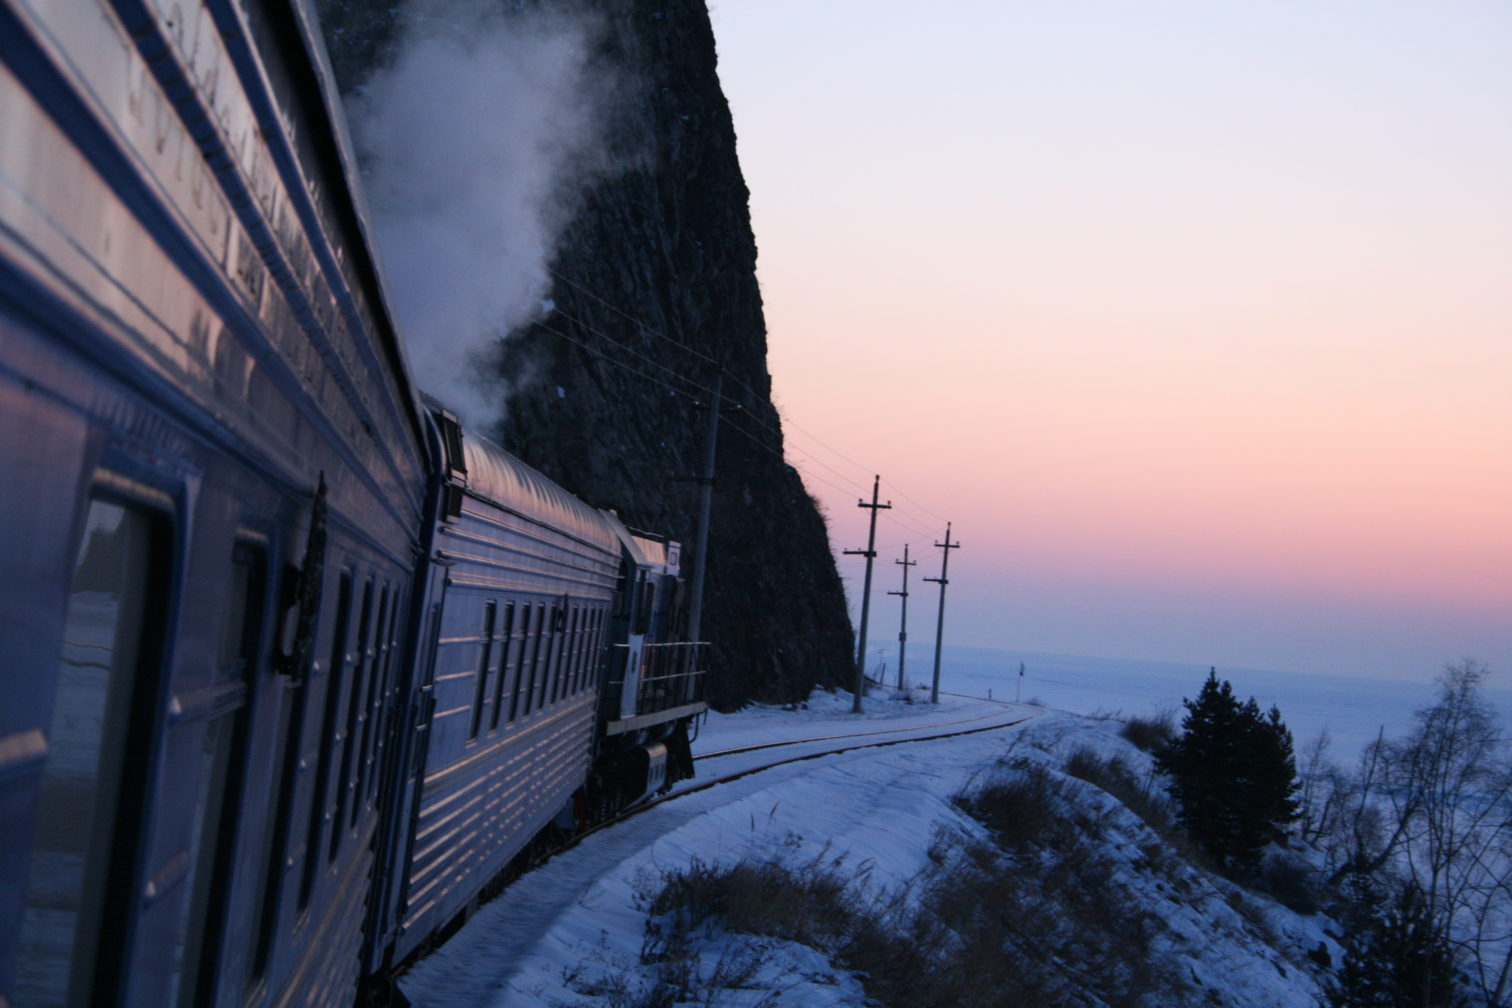 A blue train steams through a wintry scene in Russia.